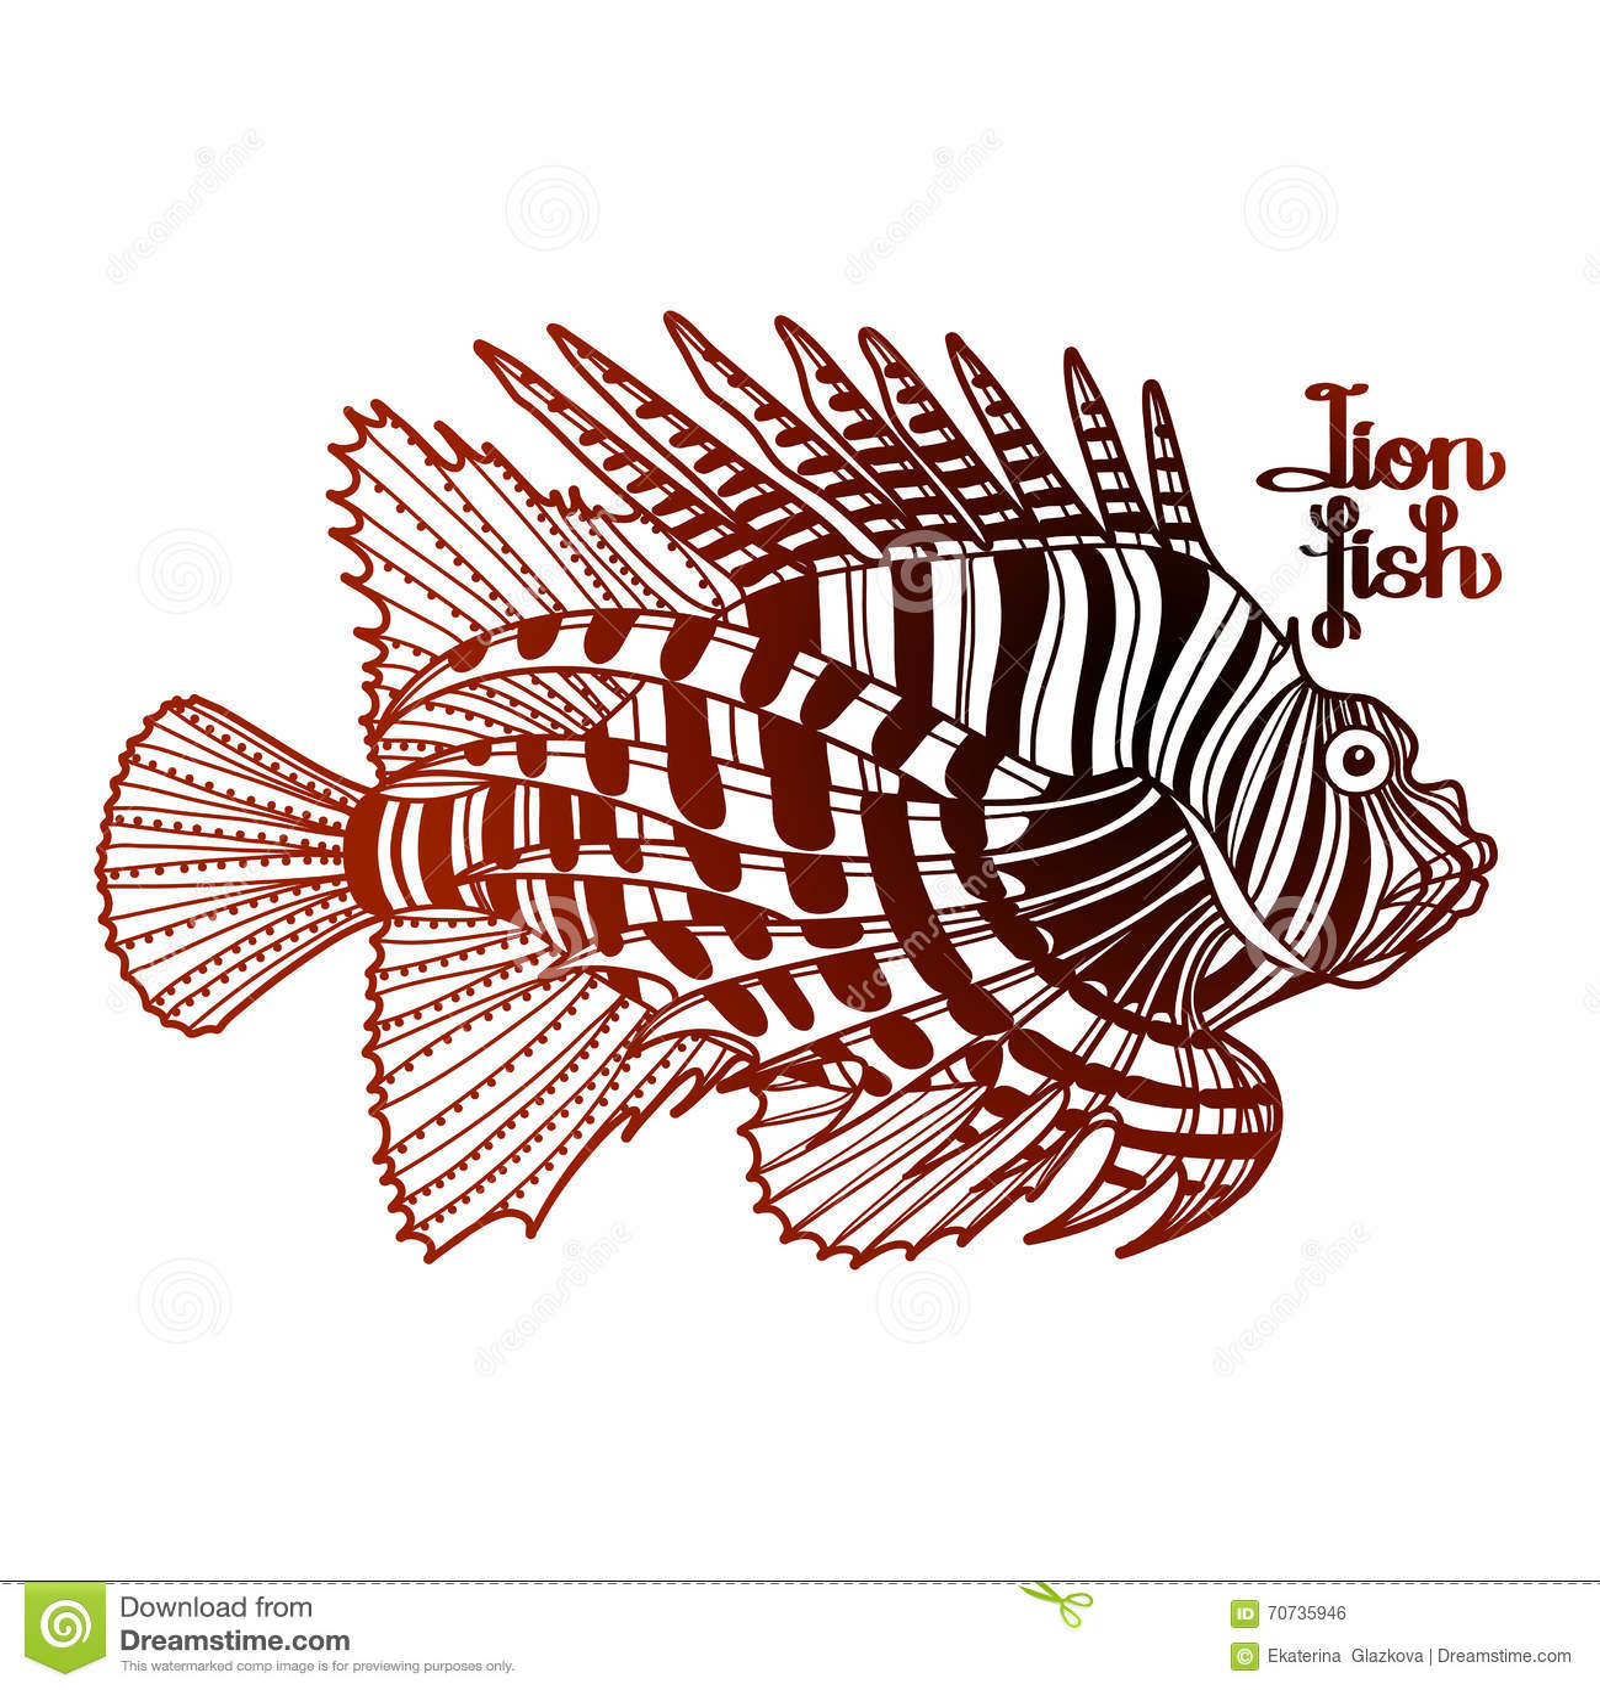 Graphic lion fish stock vector. Illustration of fish - 70735946